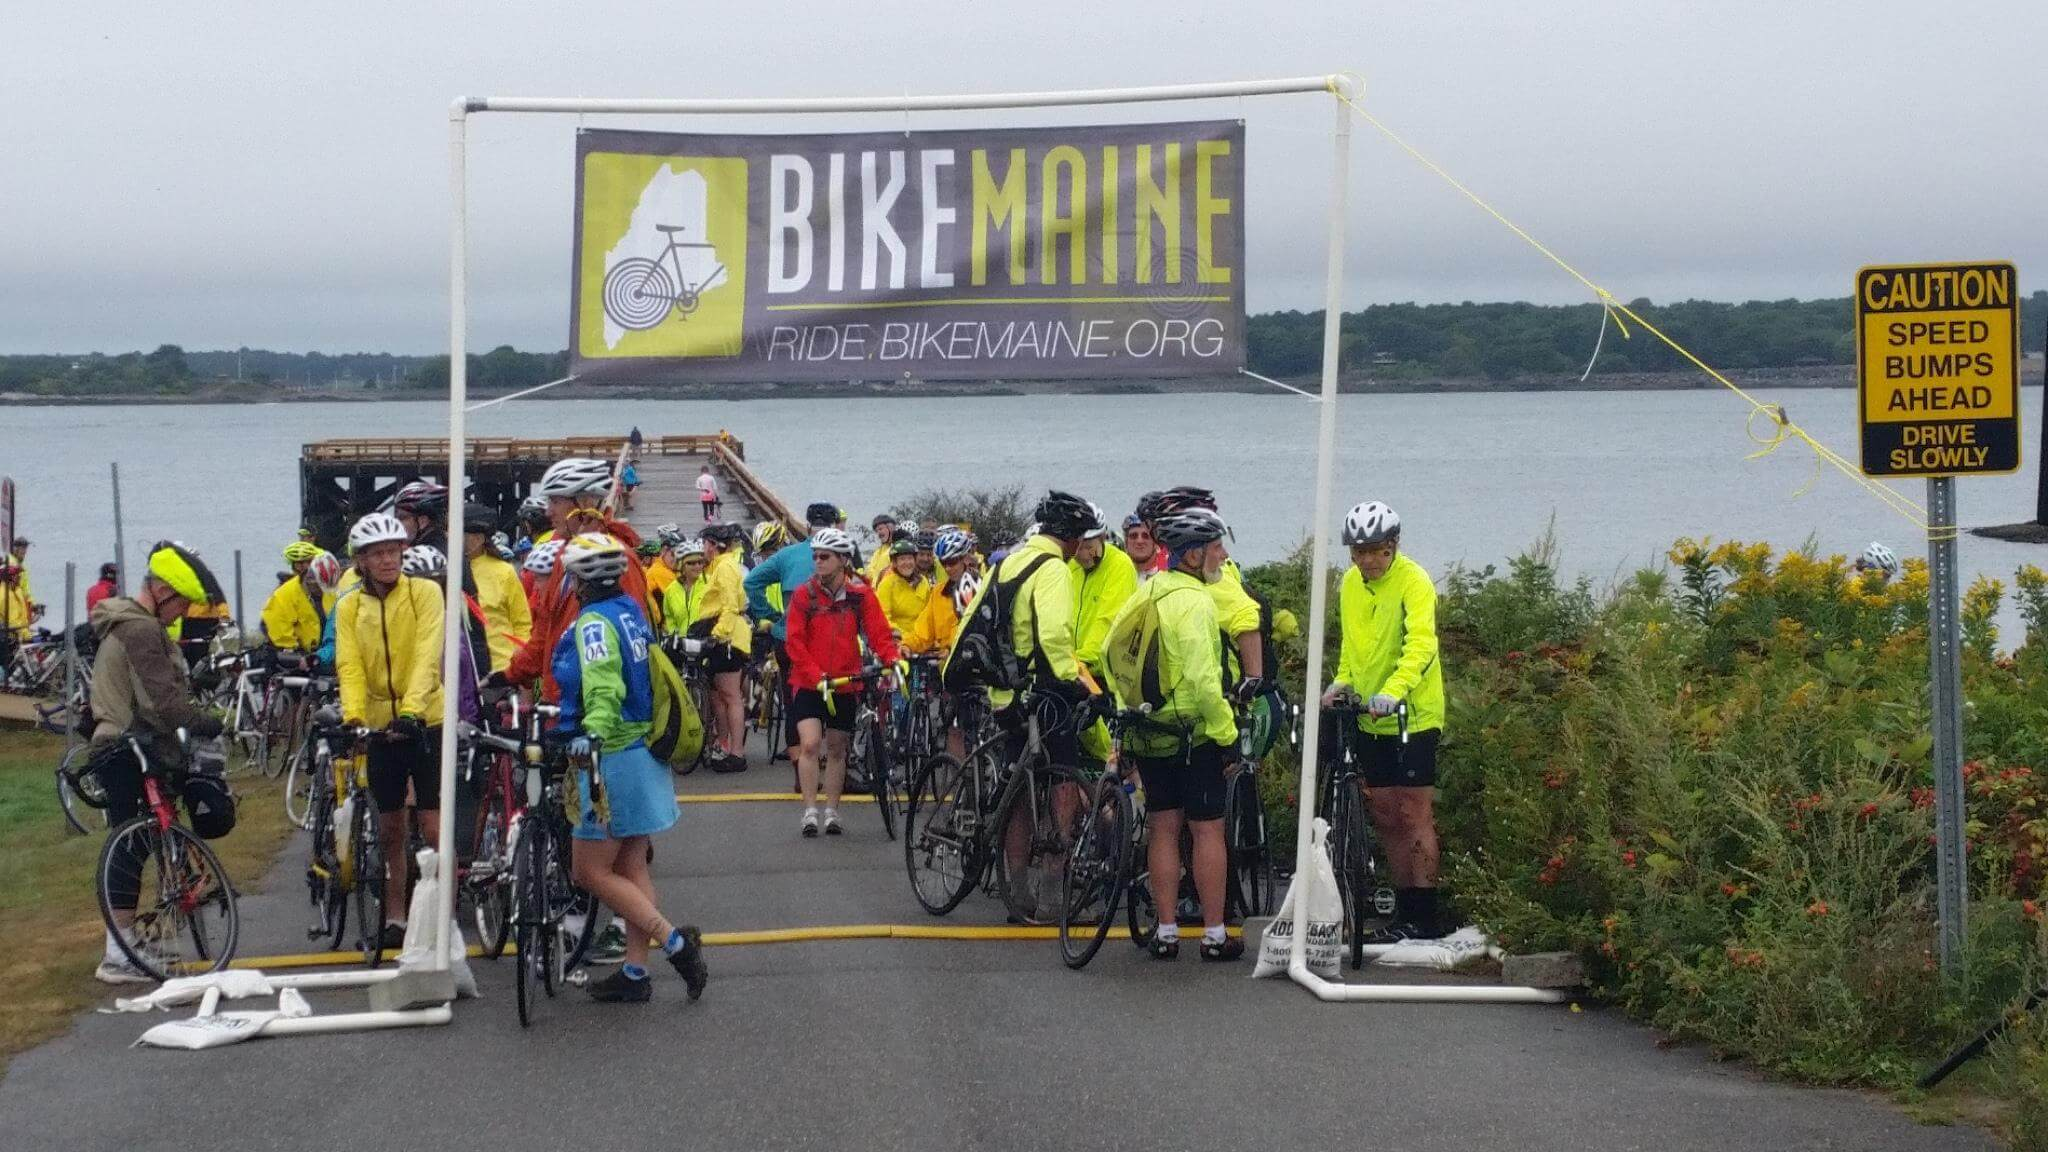 The Bike Maine starting line in Kittery